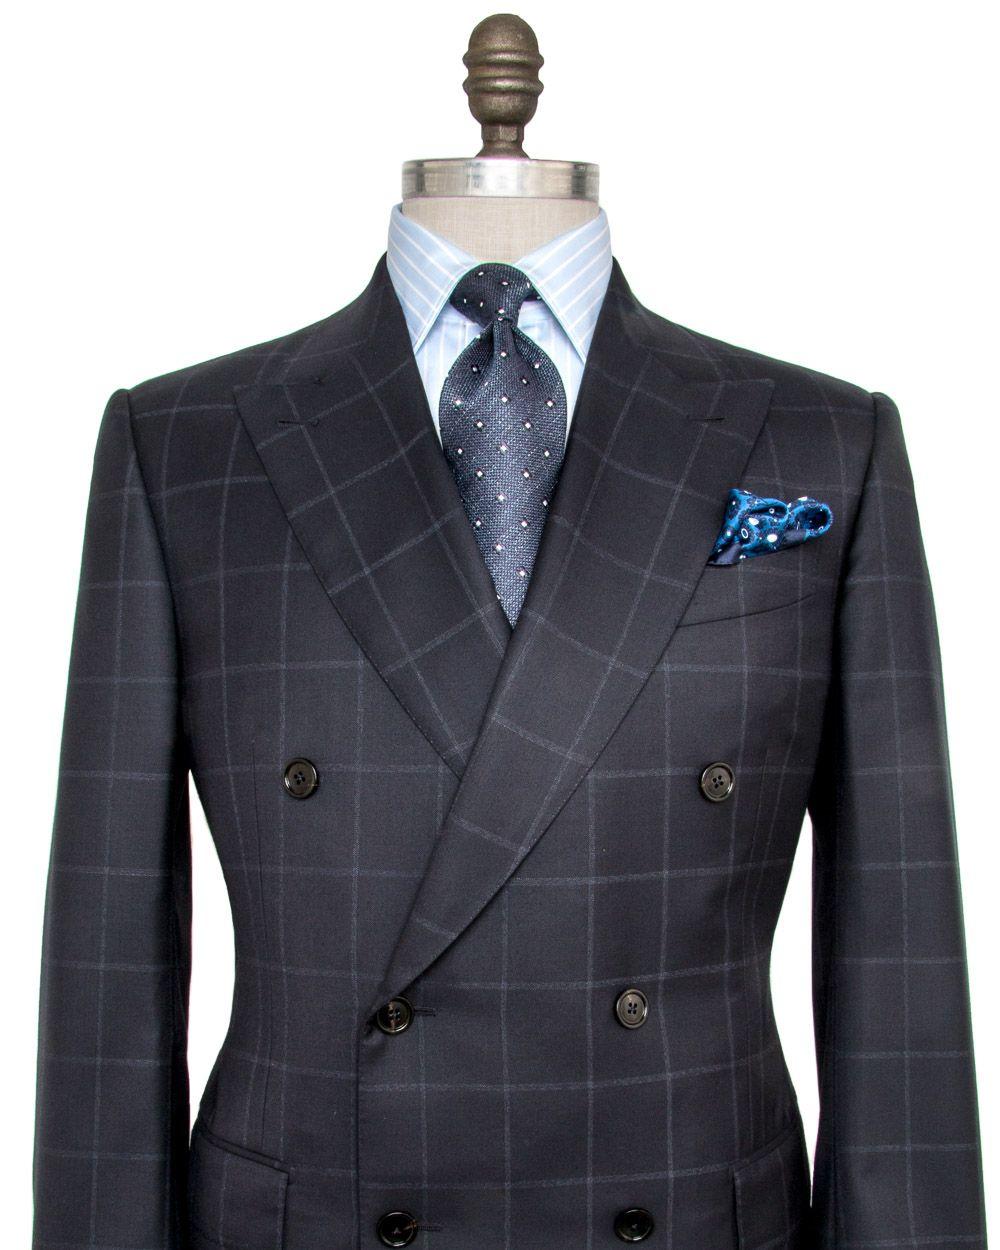 30ad4b9f73b4 Ermenegildo Zegna Navy Windowpane Suit Double breasted jacket Peak lapel  Pick…